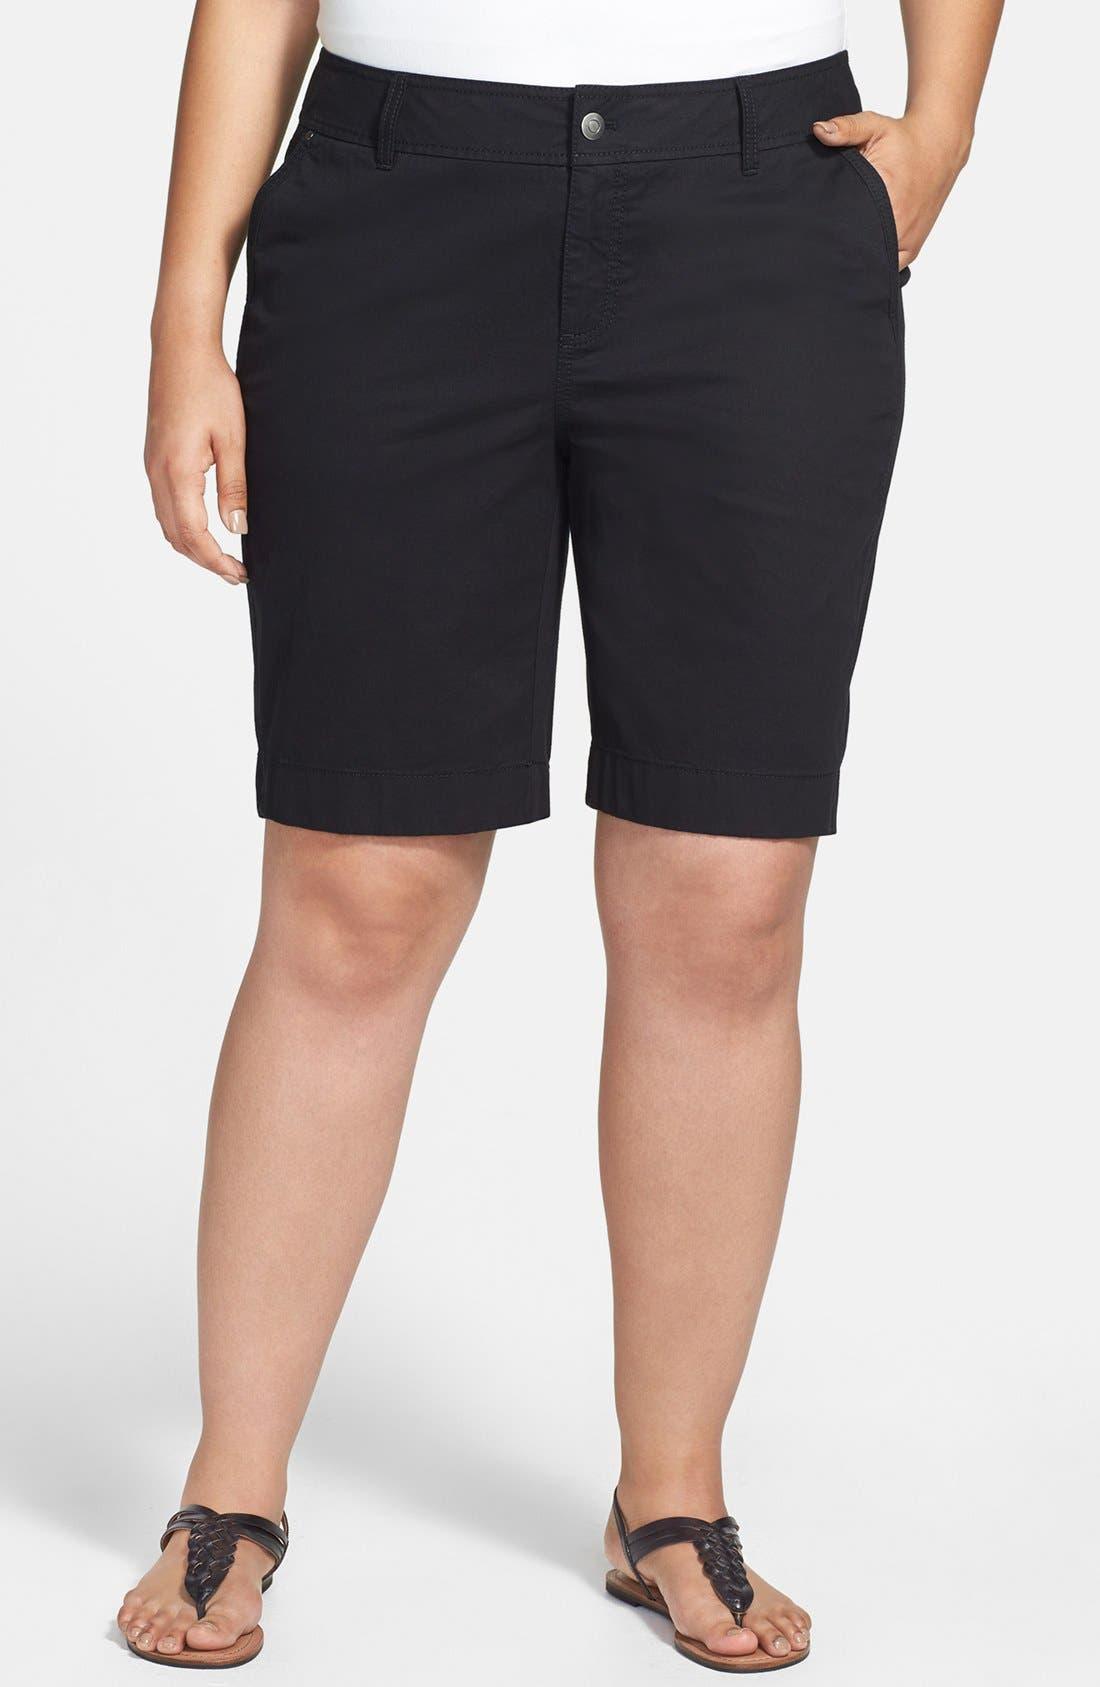 Alternate Image 1 Selected - Sejour 'Megan' Stretch Cotton Bermuda Shorts (Plus Size)